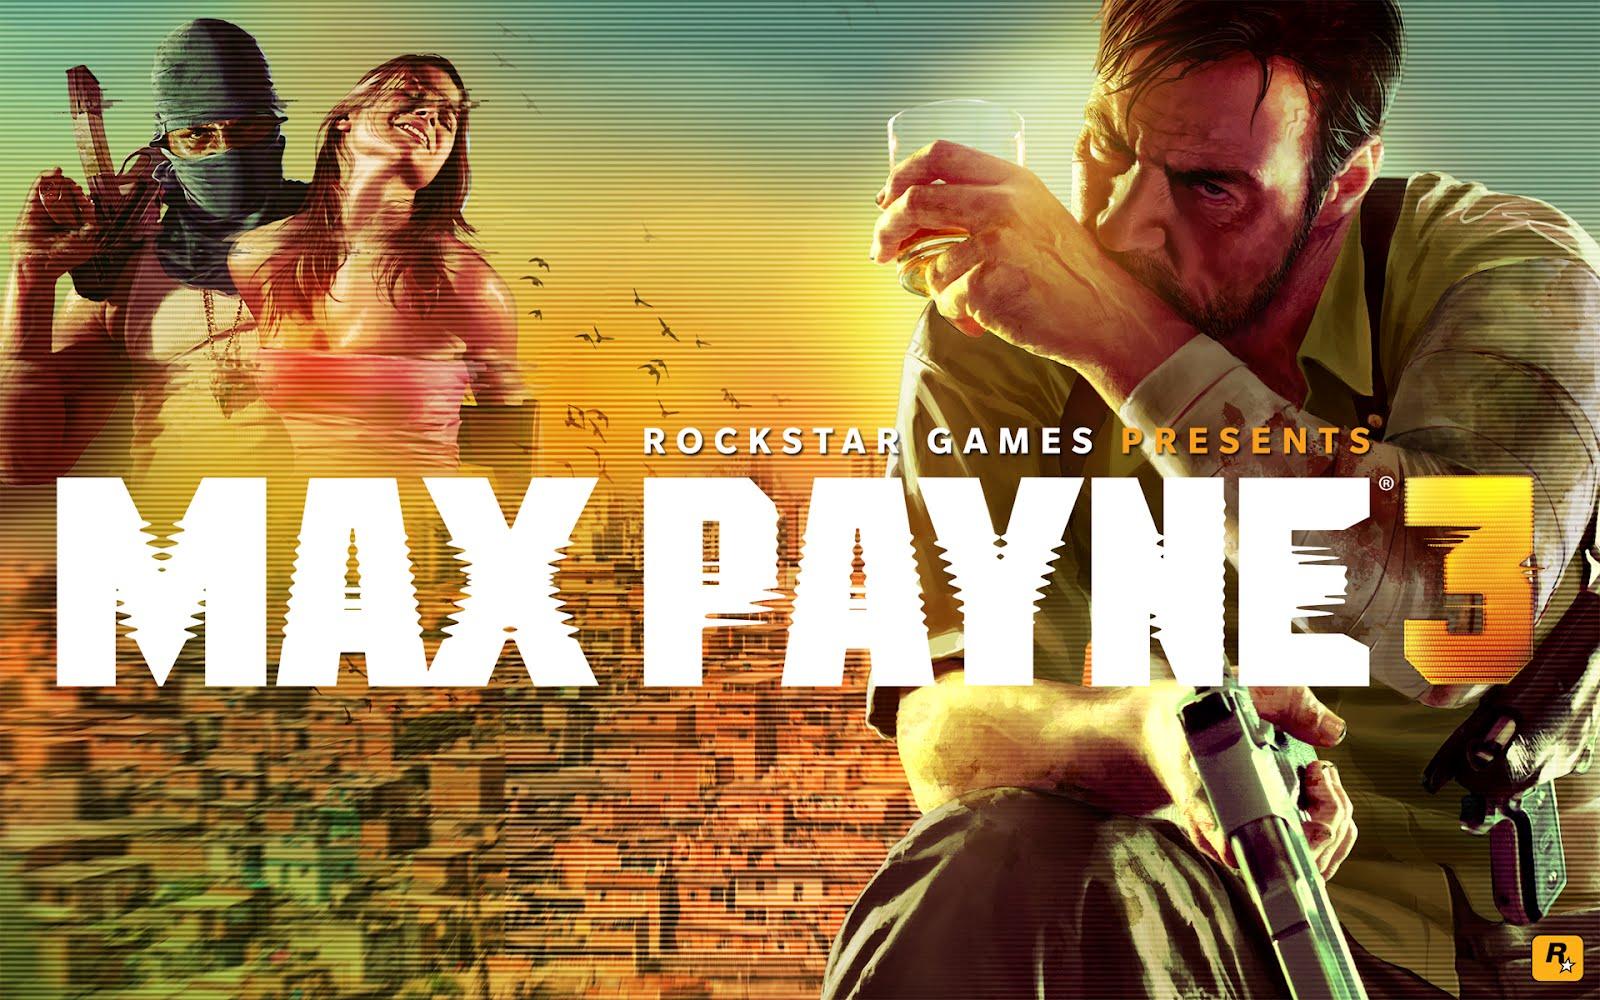 http://3.bp.blogspot.com/-f1-LEH1BlMw/T082koUXrVI/AAAAAAAABgo/hYcPTBUWjPA/s1600/max_payne_3_2012_game-wide.jpg